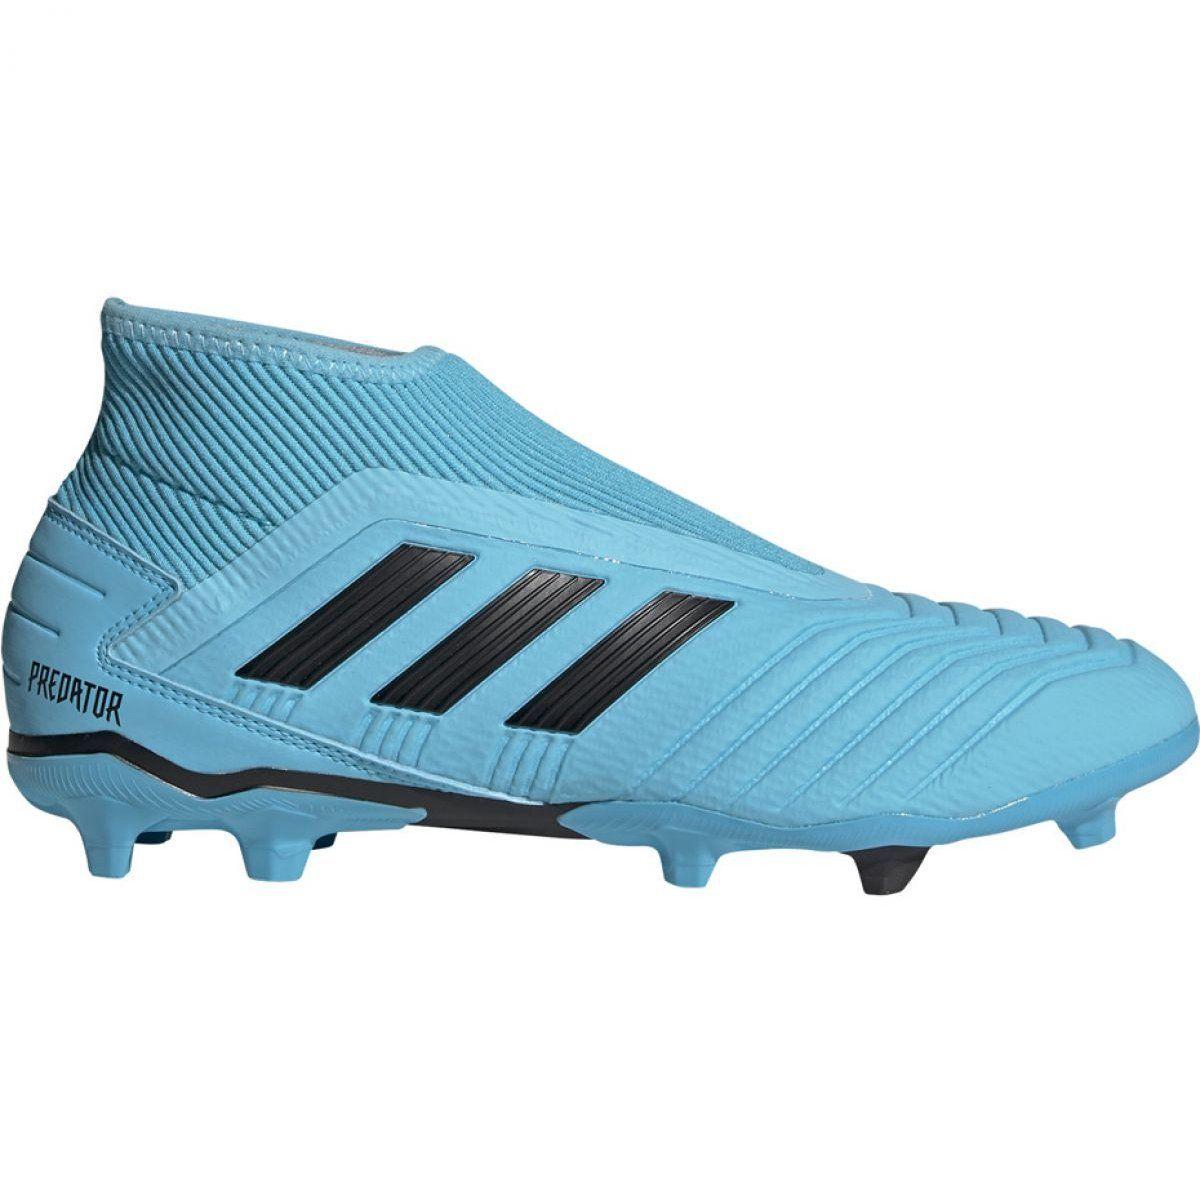 Buty Pilkarskie Adidas Predator 19 3 Ll Fg M G27923 Wielokolorowe Niebieskie Adidas Predator Football Shoes Adidas